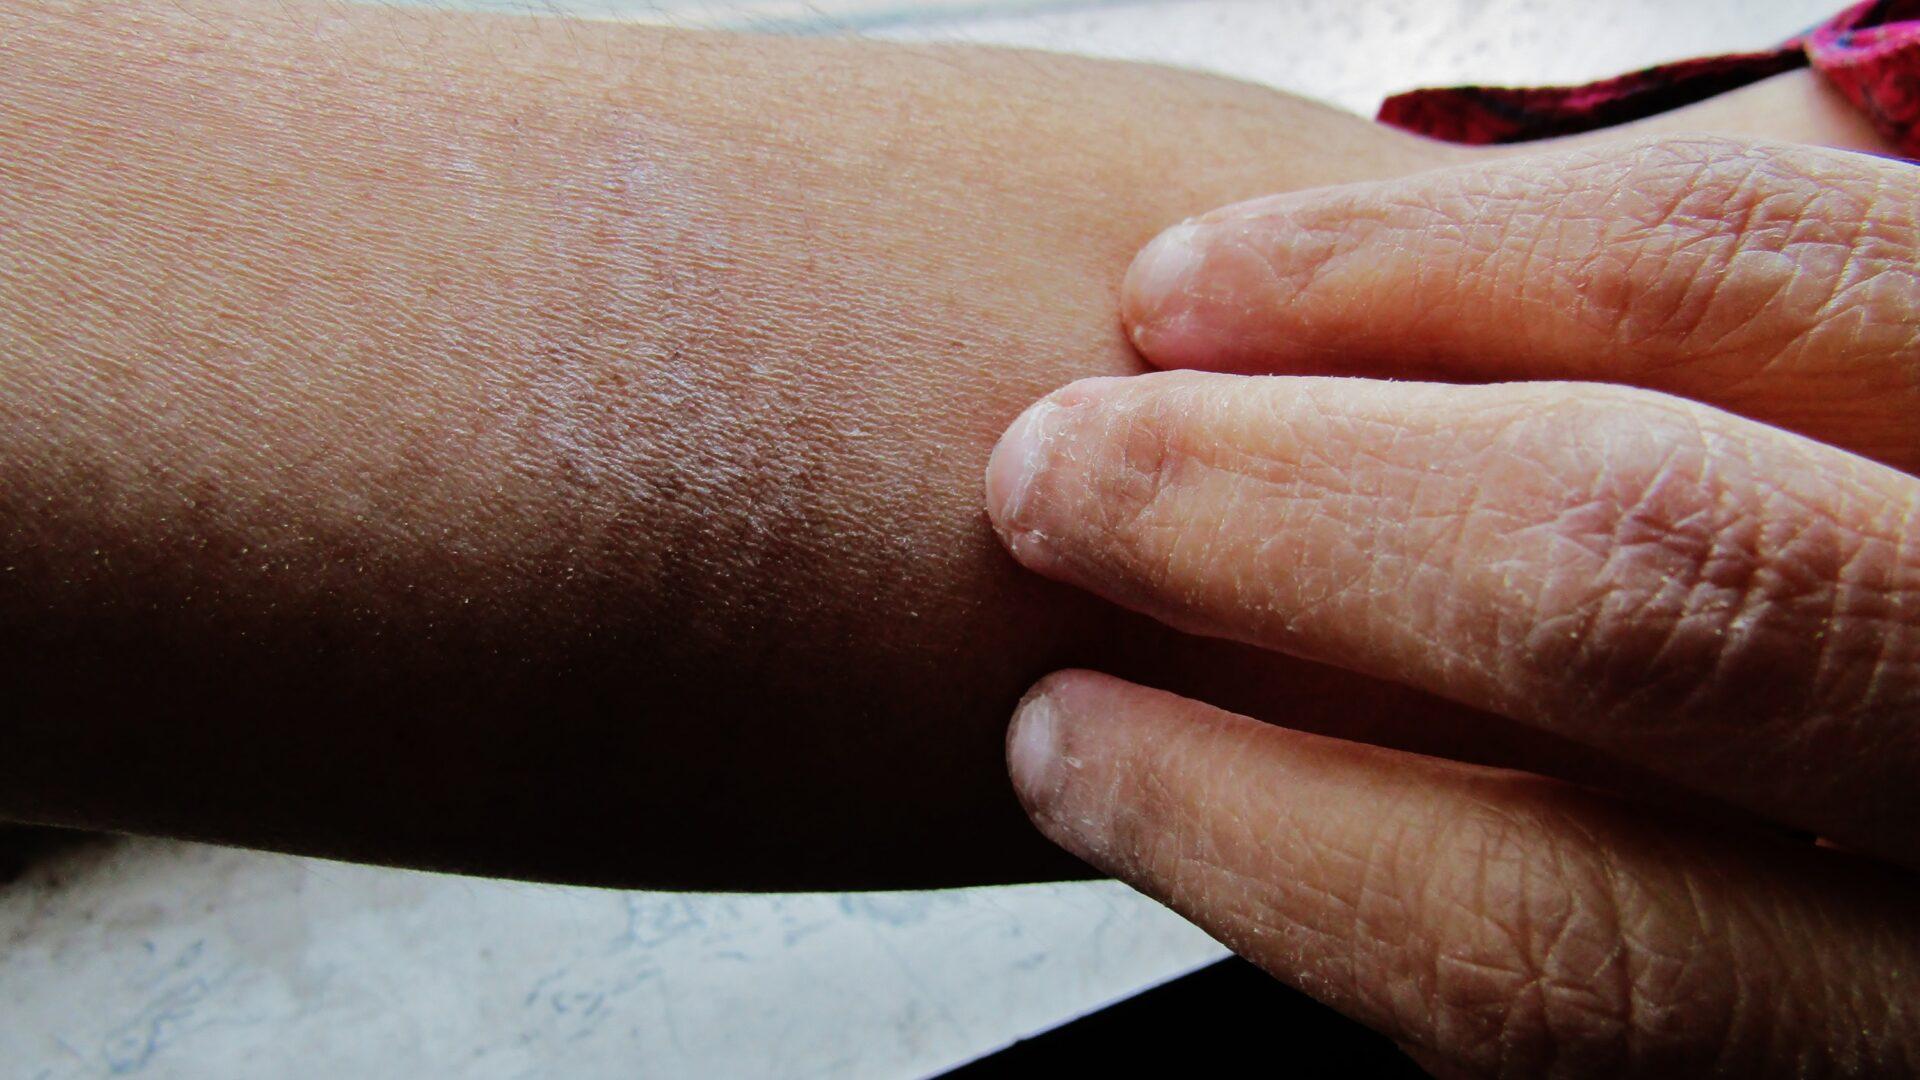 Co oznacza sucha skóra na dłoniach